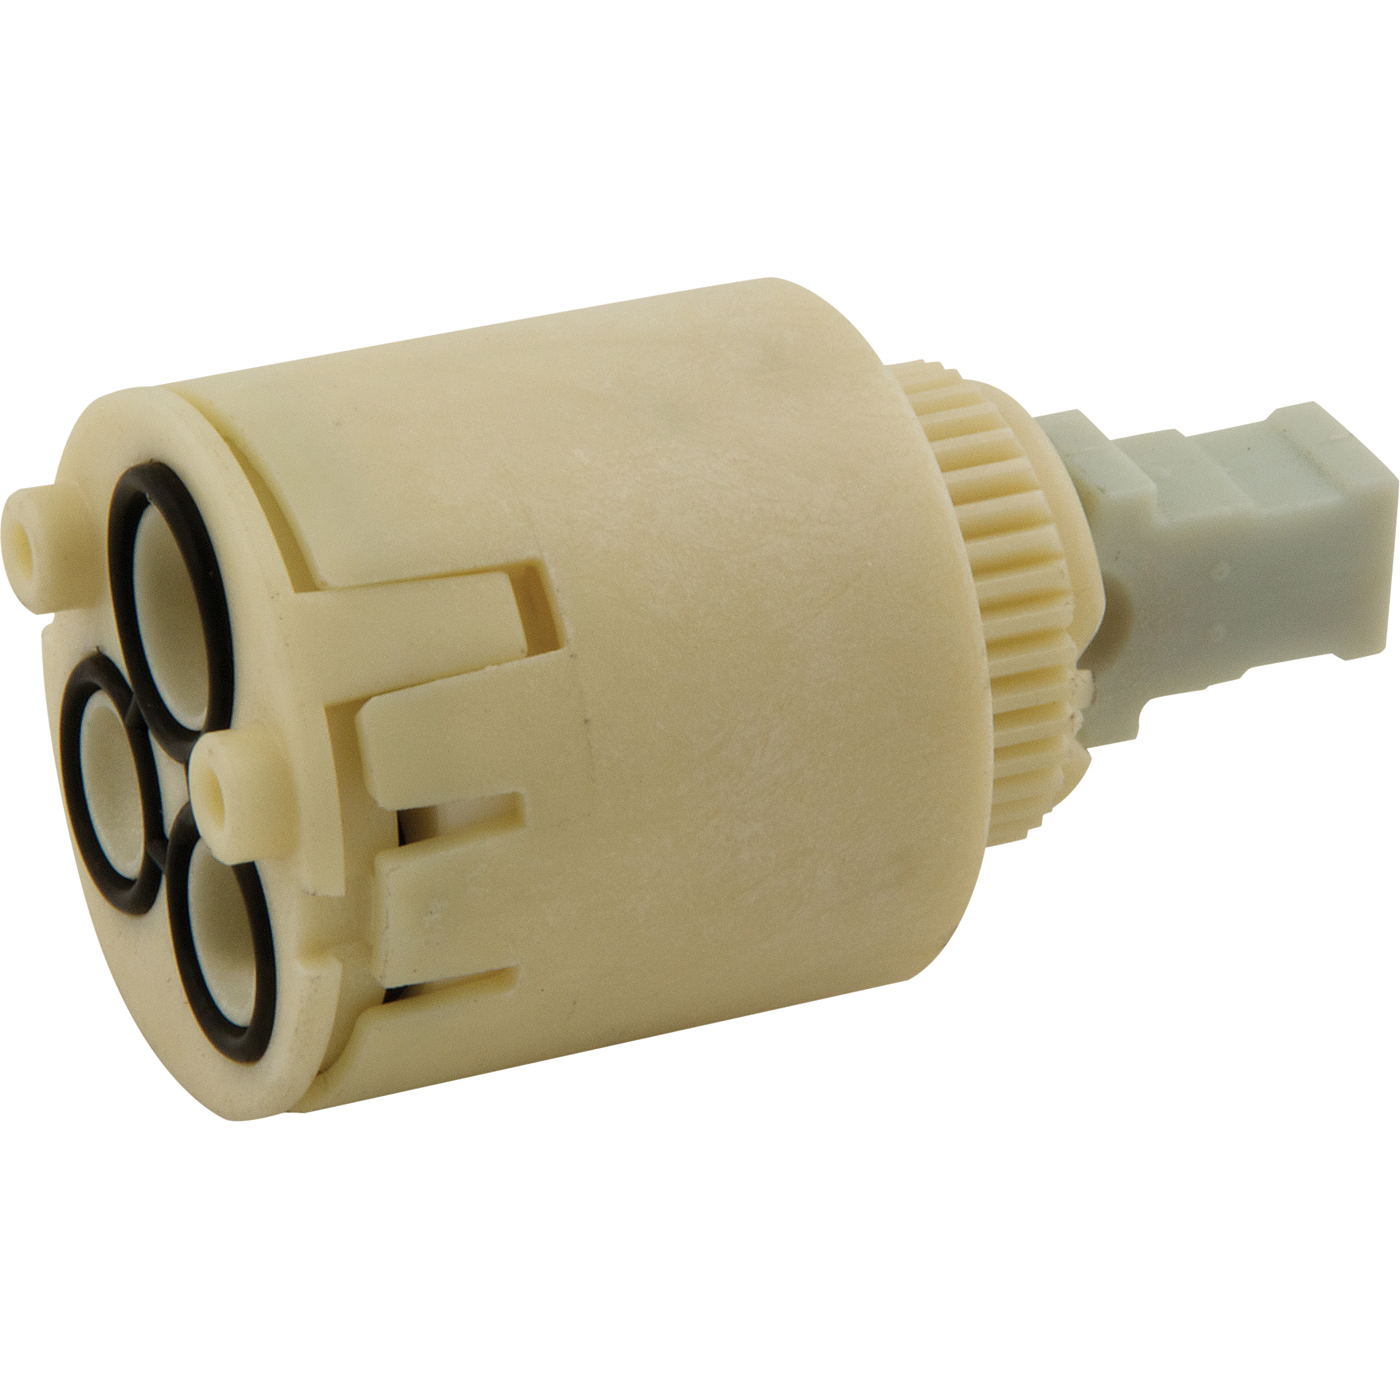 Kohler 174 Single Handle Faucet Cartridge Master Plumber 174